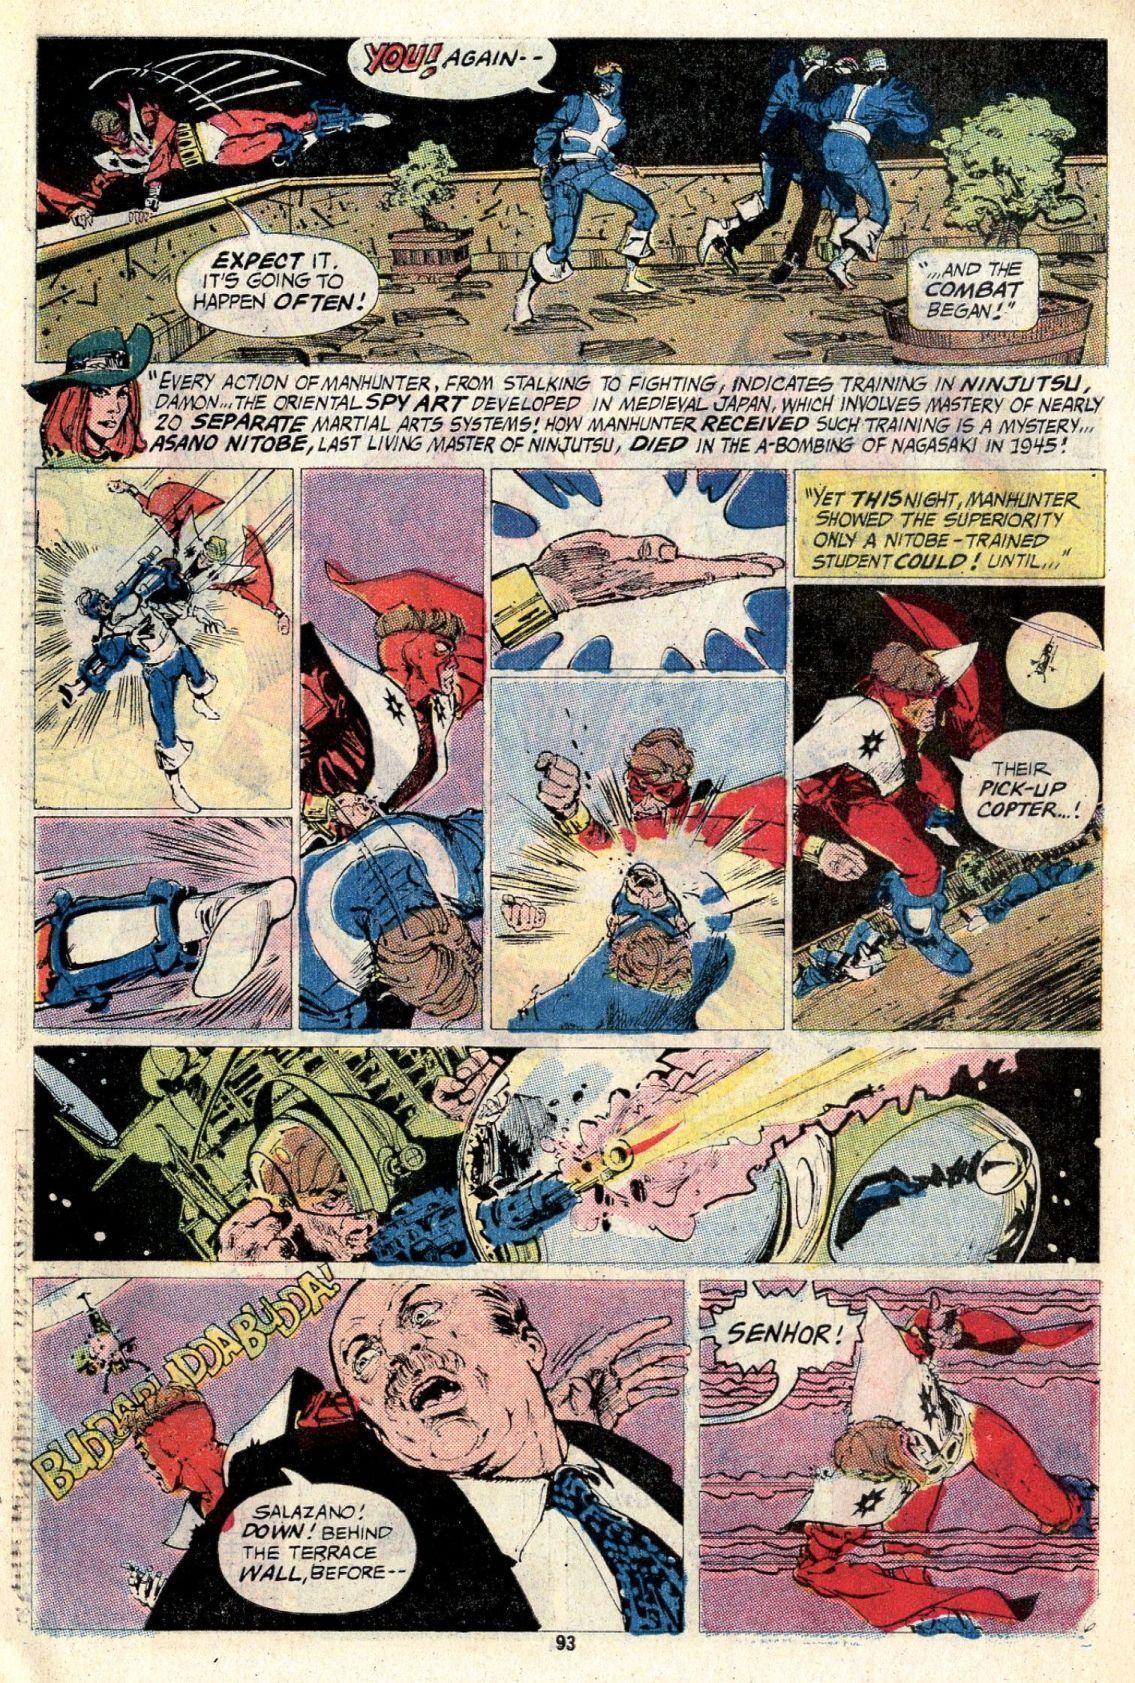 Detective Comics (1937) 438 Page 93